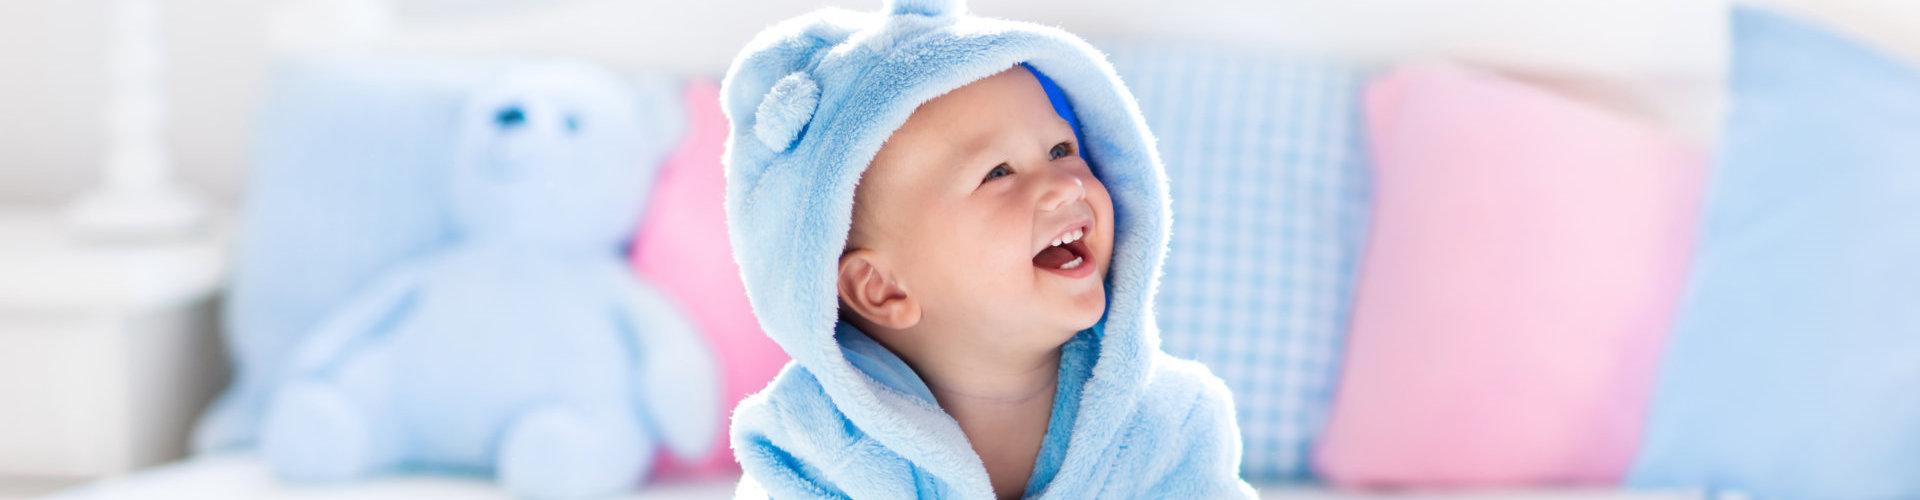 Cute happy laughing baby boy in soft bathrobe after bath playing